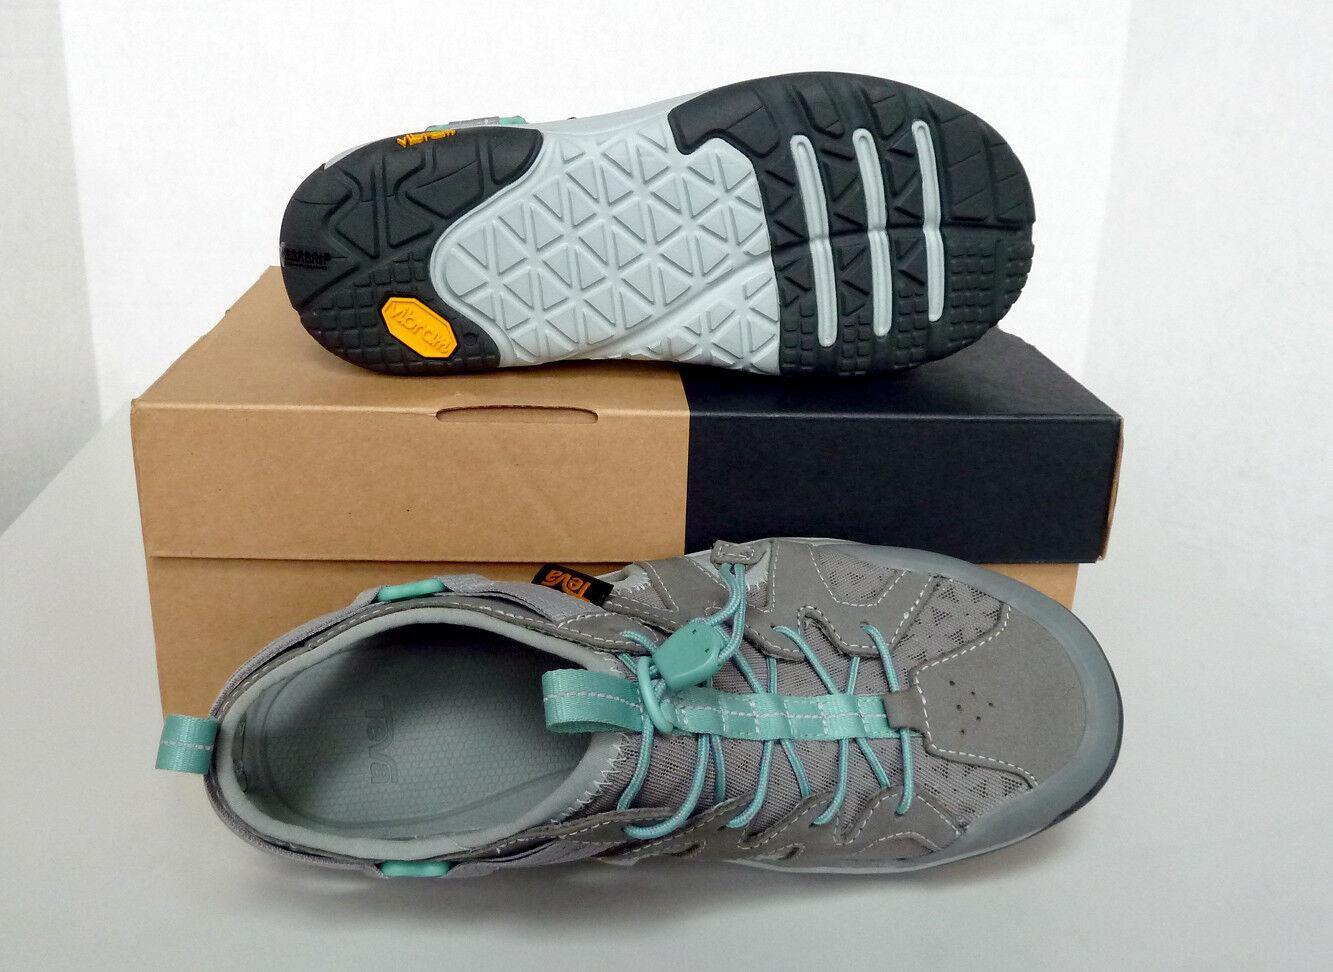 New Damens`s Teva Lace Terra-Float Active Lace Teva Schuhes Sport Sandales 1018733 6795cd